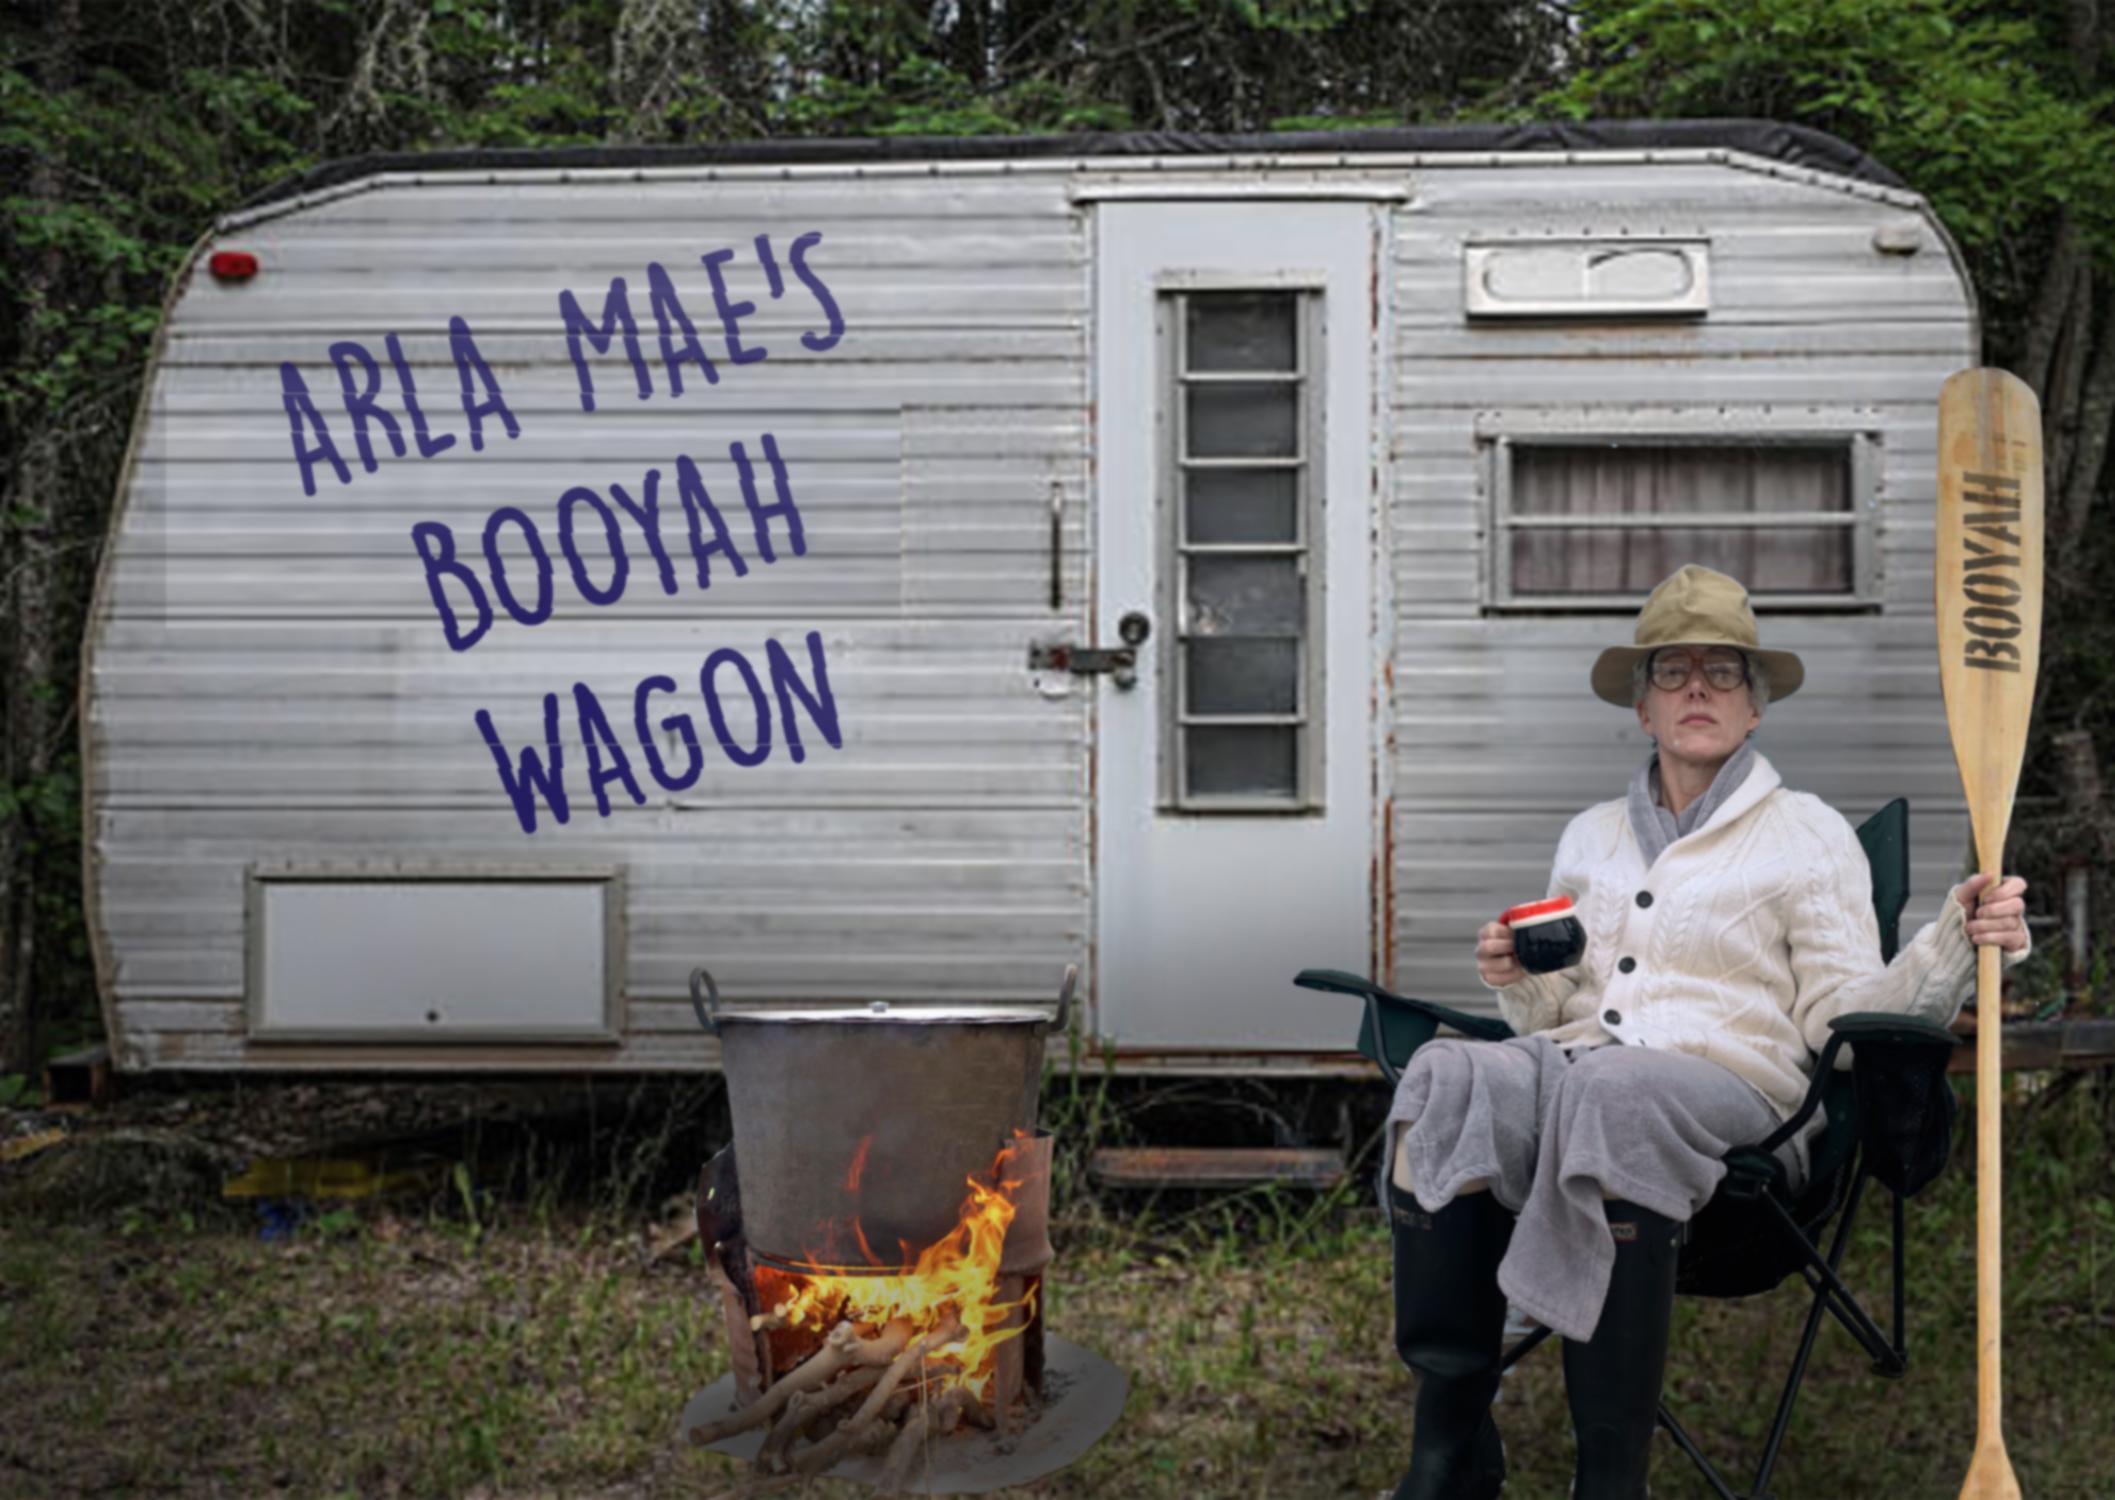 "Caption: ""Arla Mae's Booyah Wagon"""